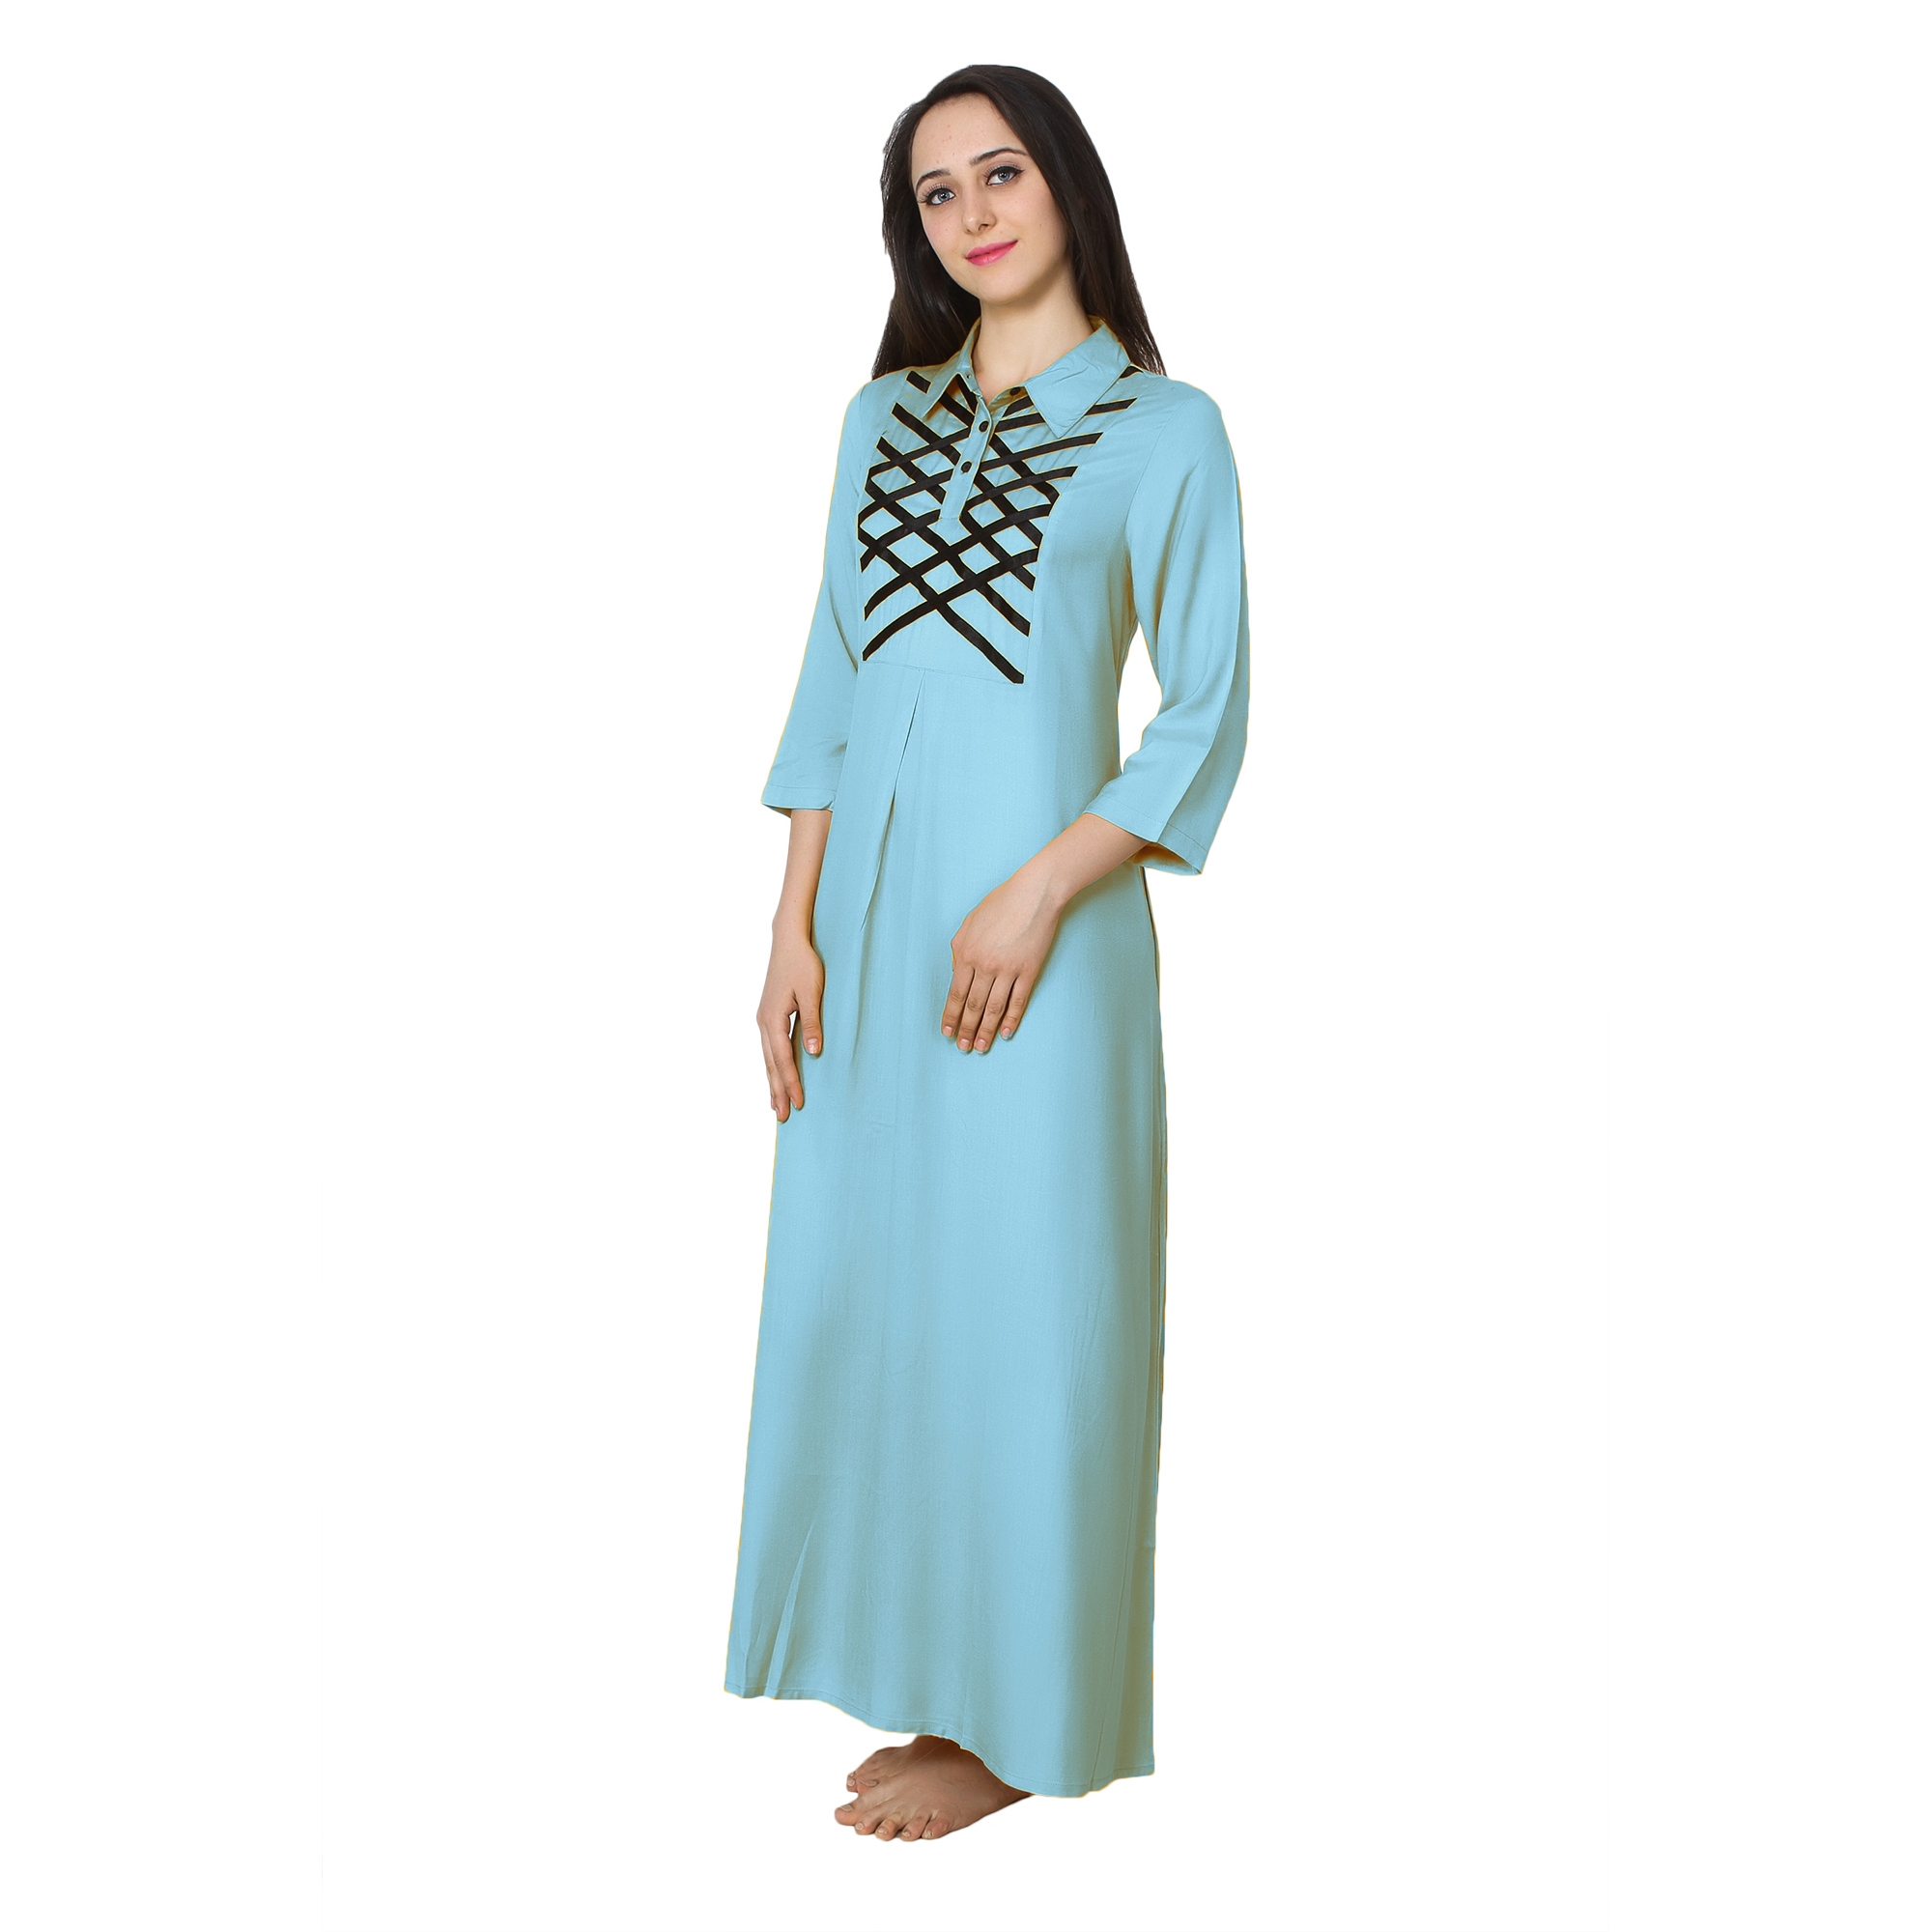 Shift Style ShirtDress in Light Blue